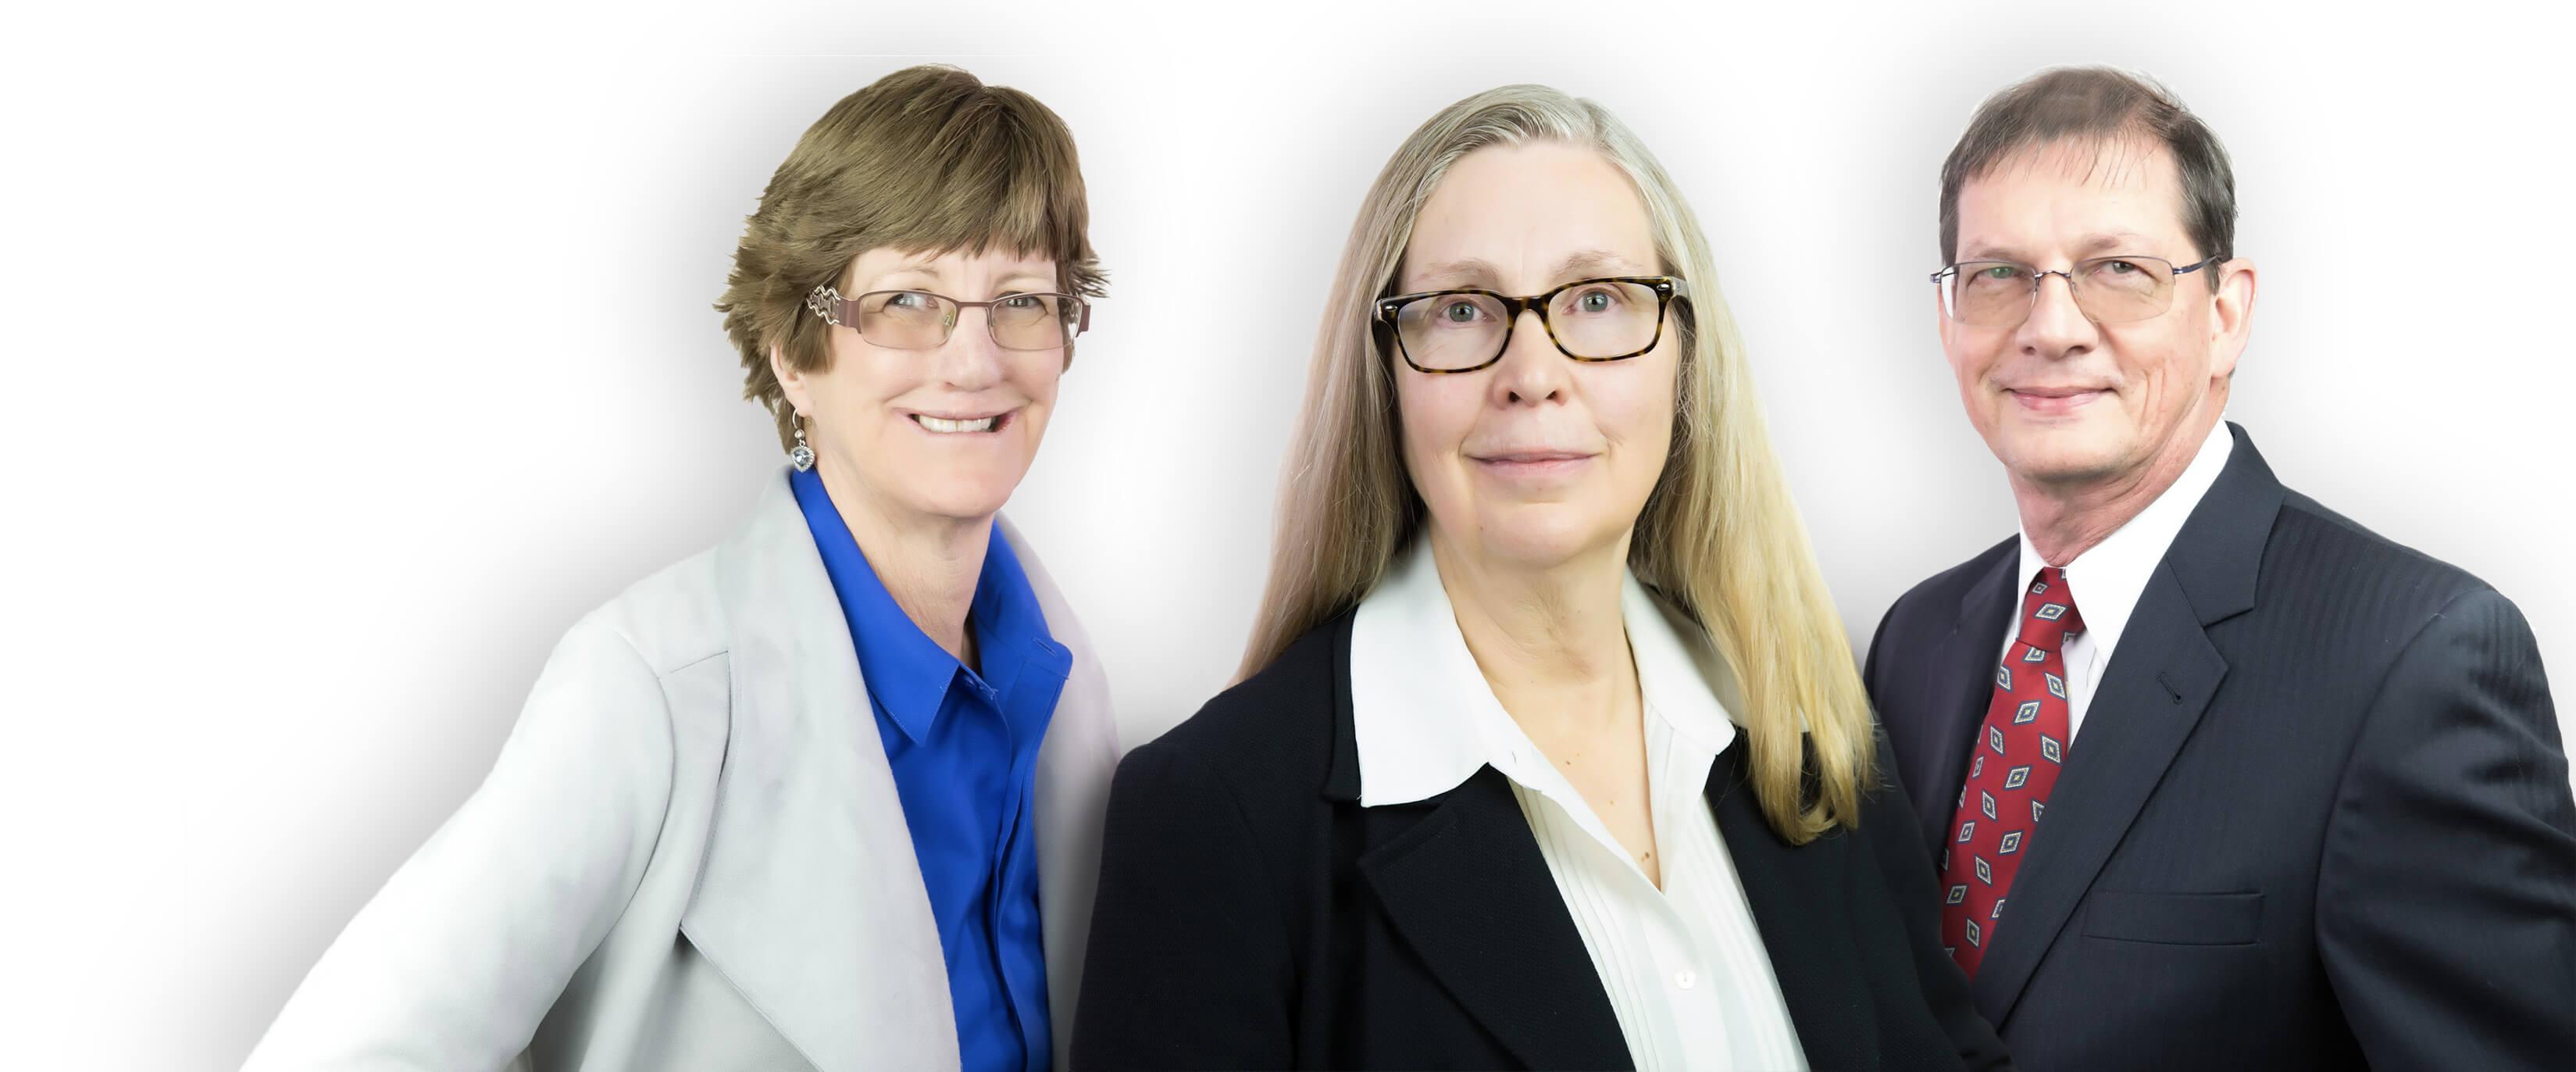 Anne Morgan, Sharon DeMonsabert, and Manie Lemmer